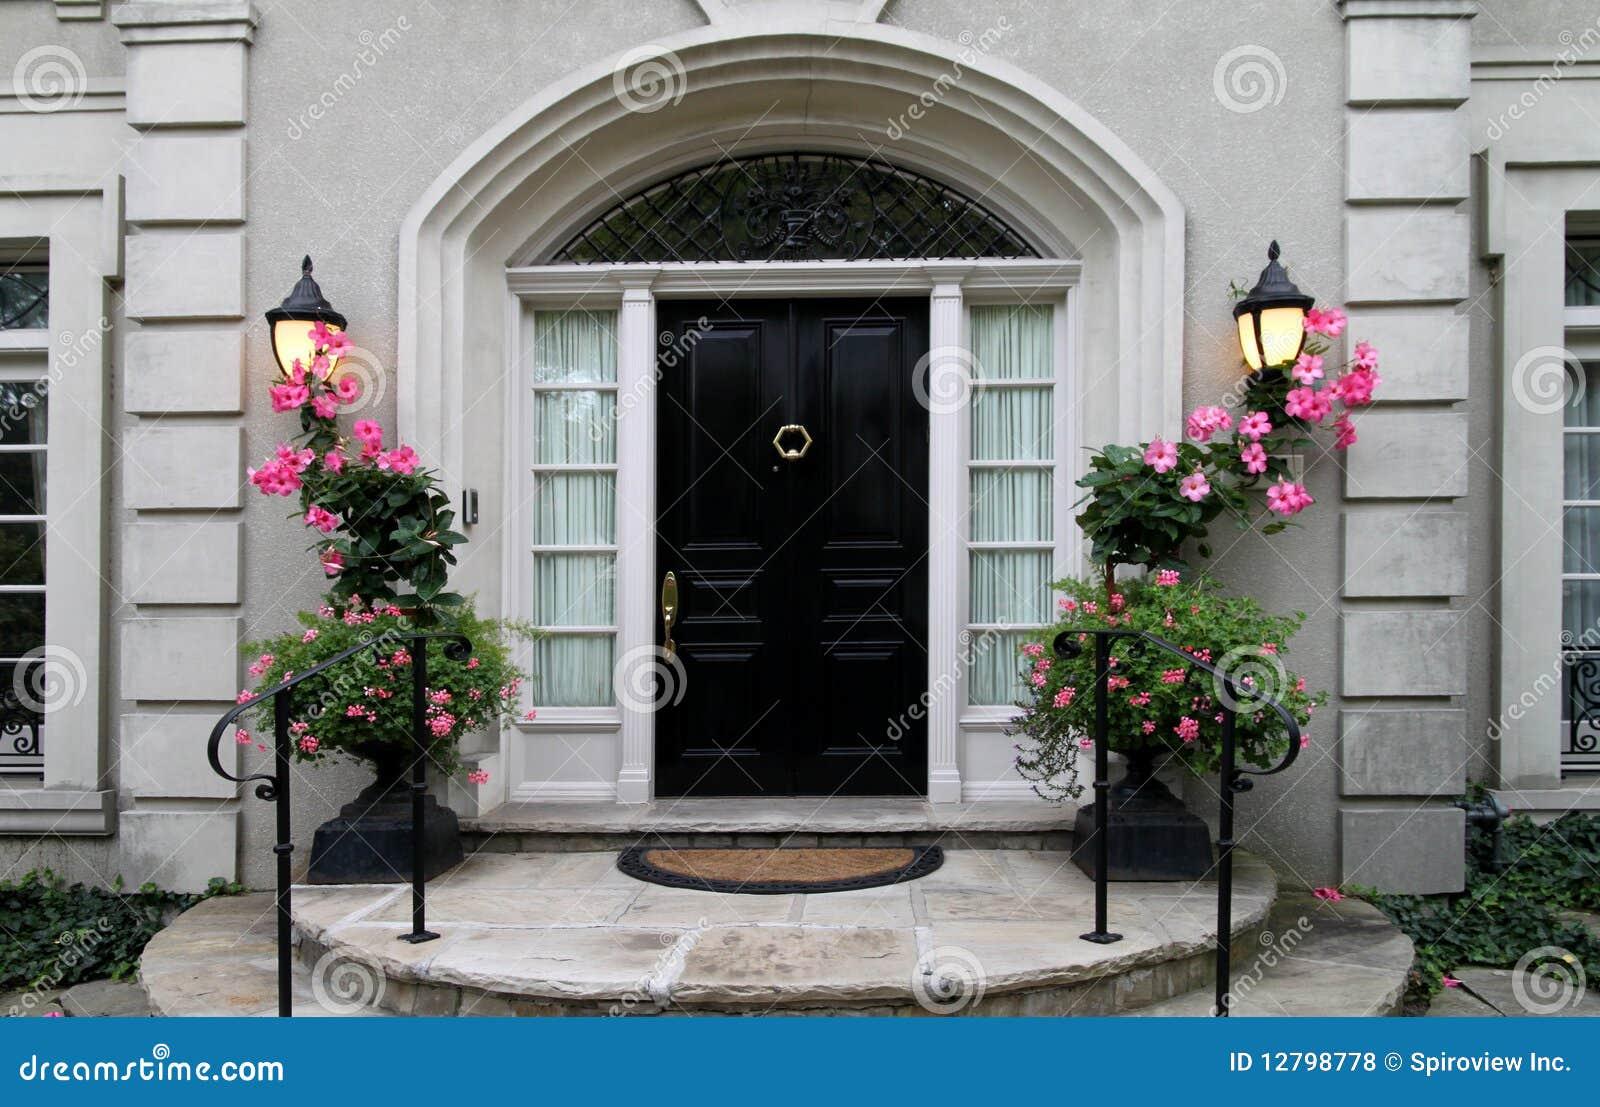 elegant front doors images galleries with a bite. Black Bedroom Furniture Sets. Home Design Ideas